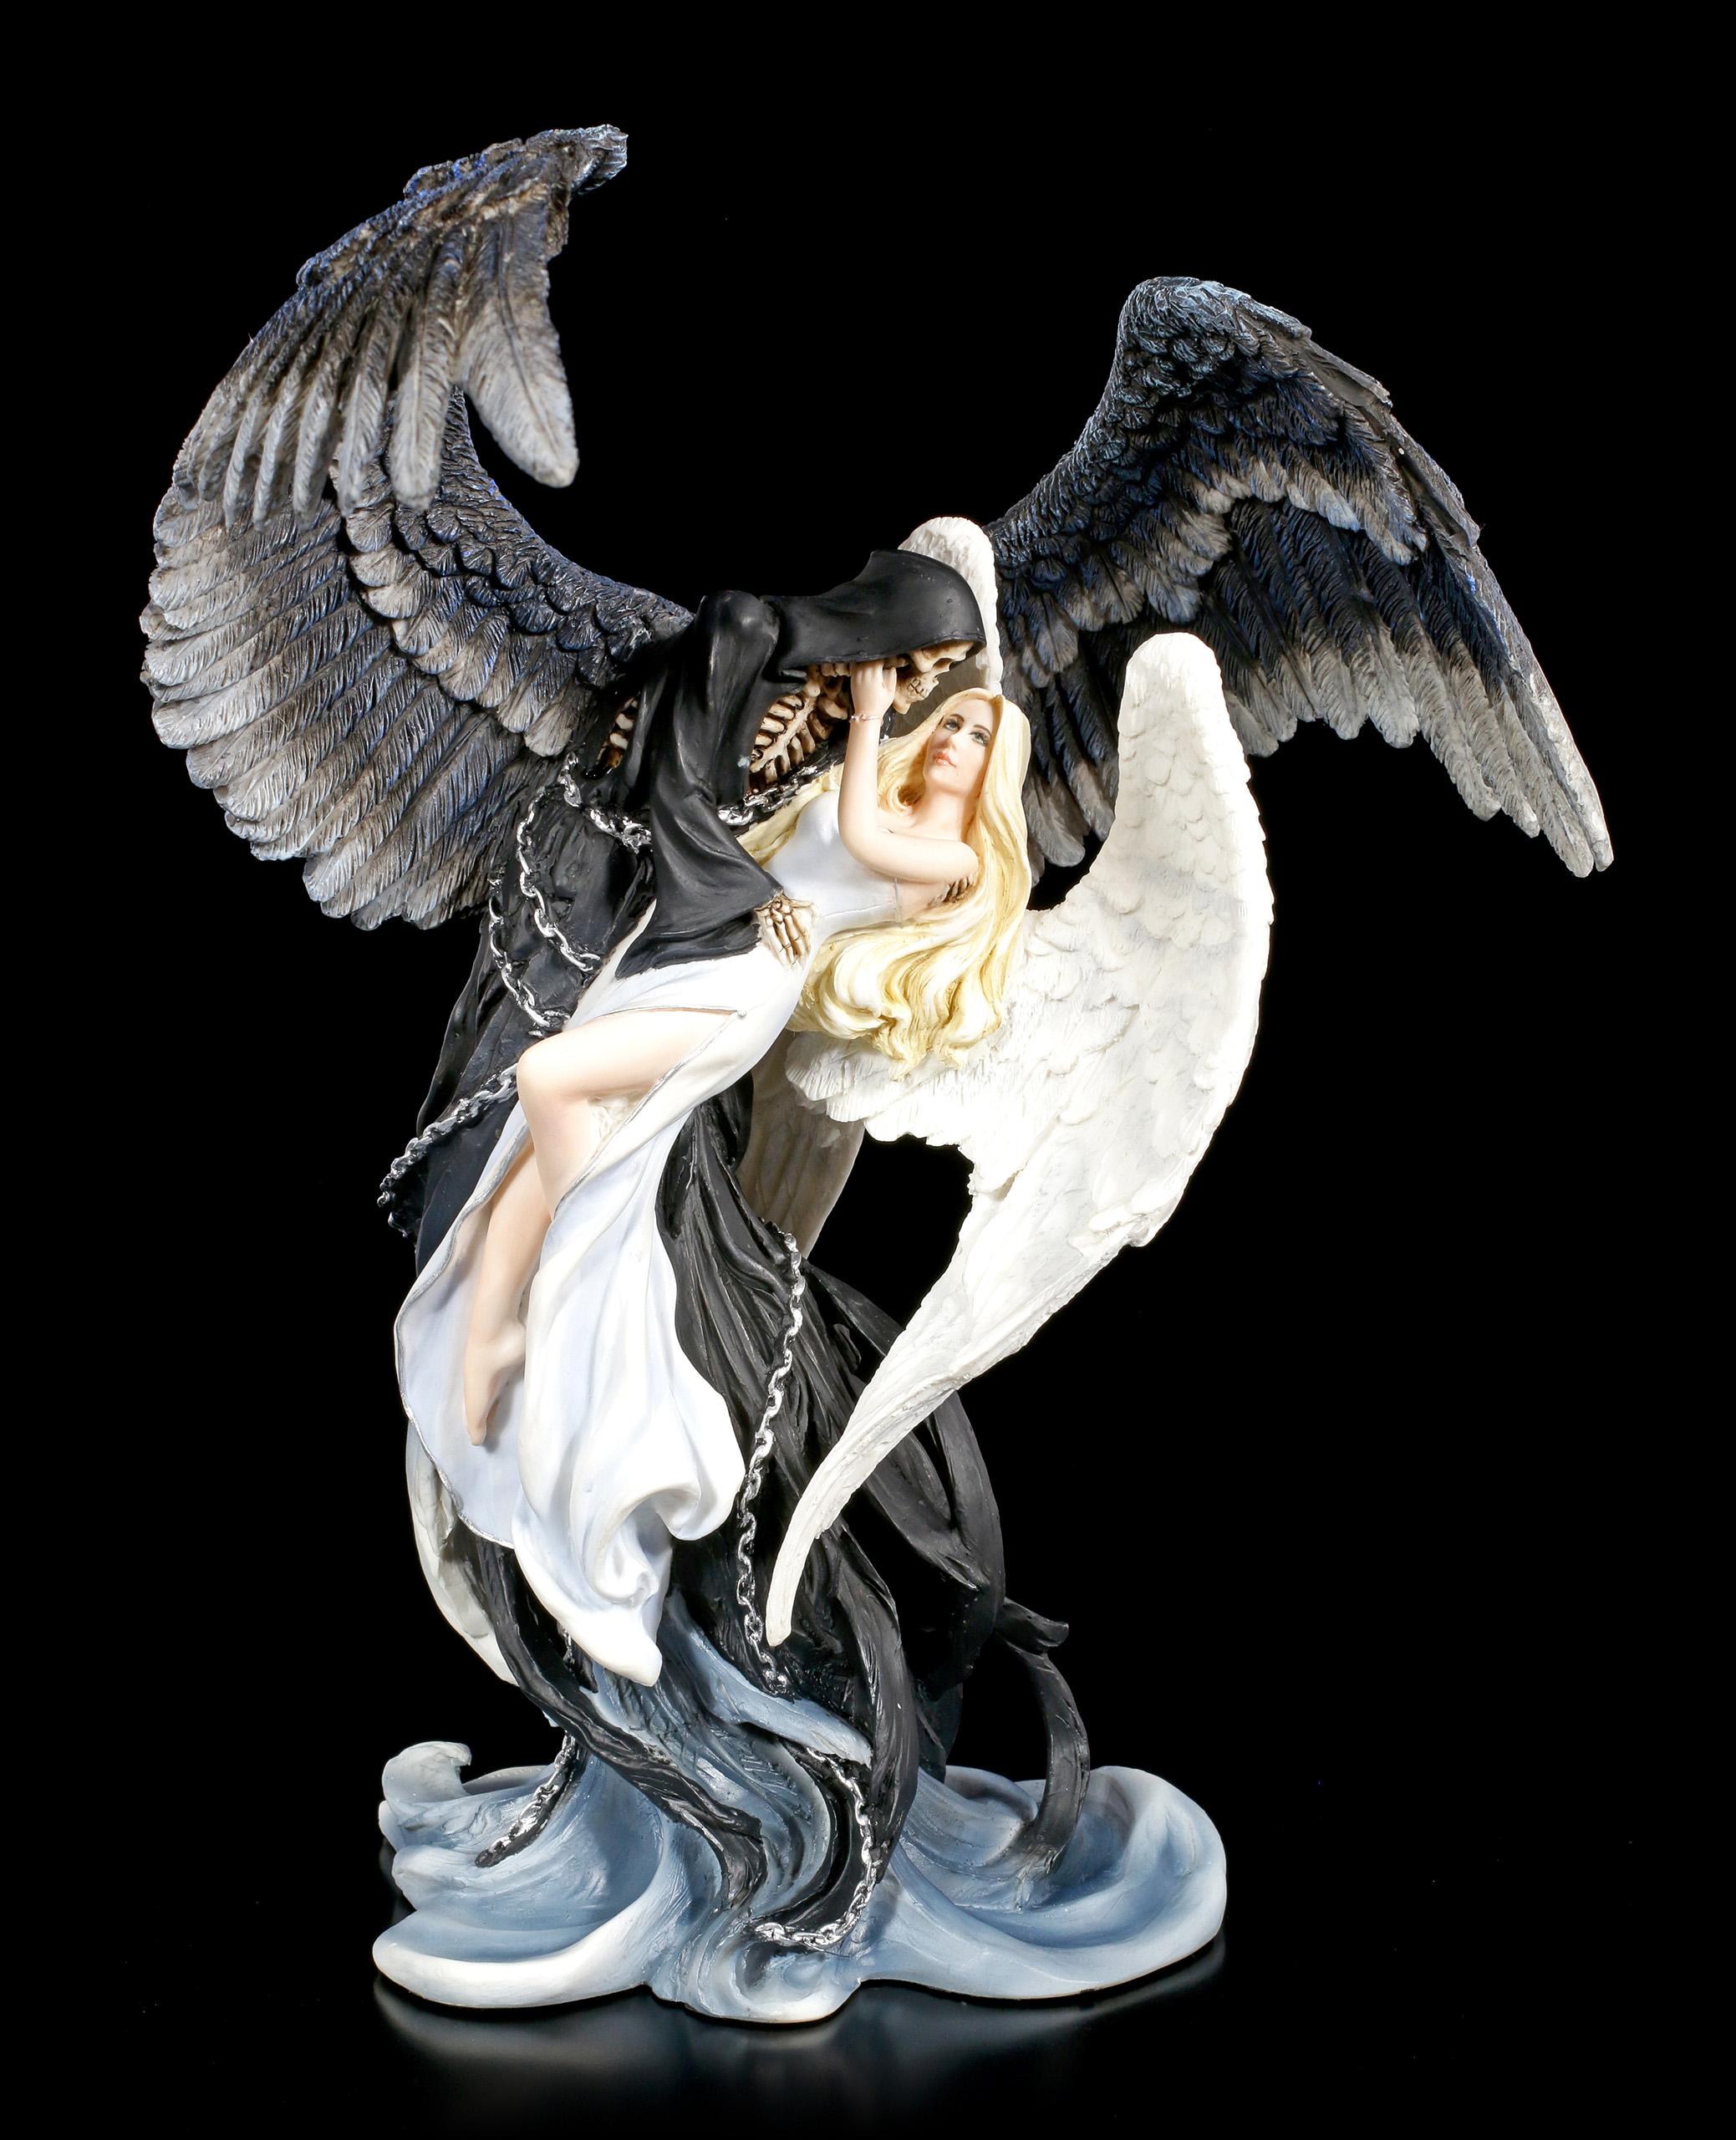 James Ryman's Angel and the Reaper Figurine   www.figuren ...